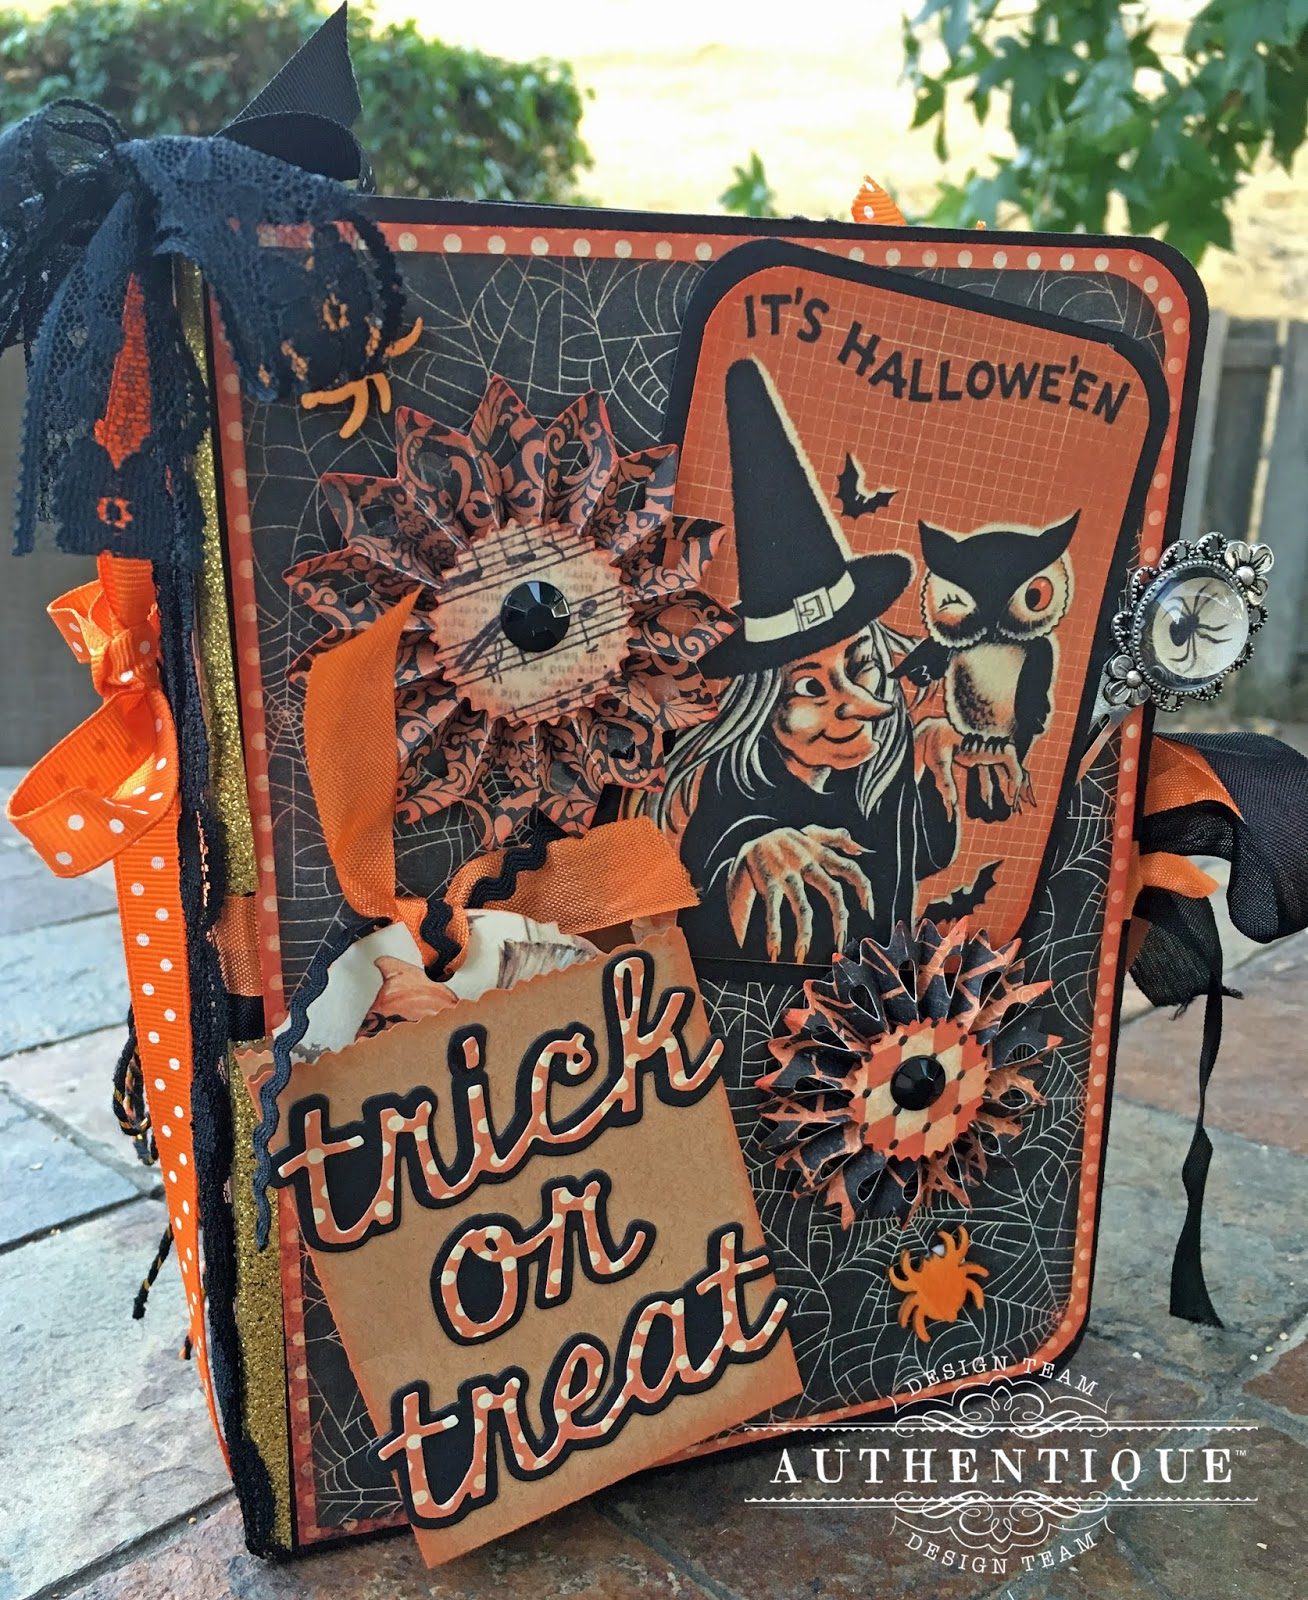 it's halloween! nightfall is here - swoon